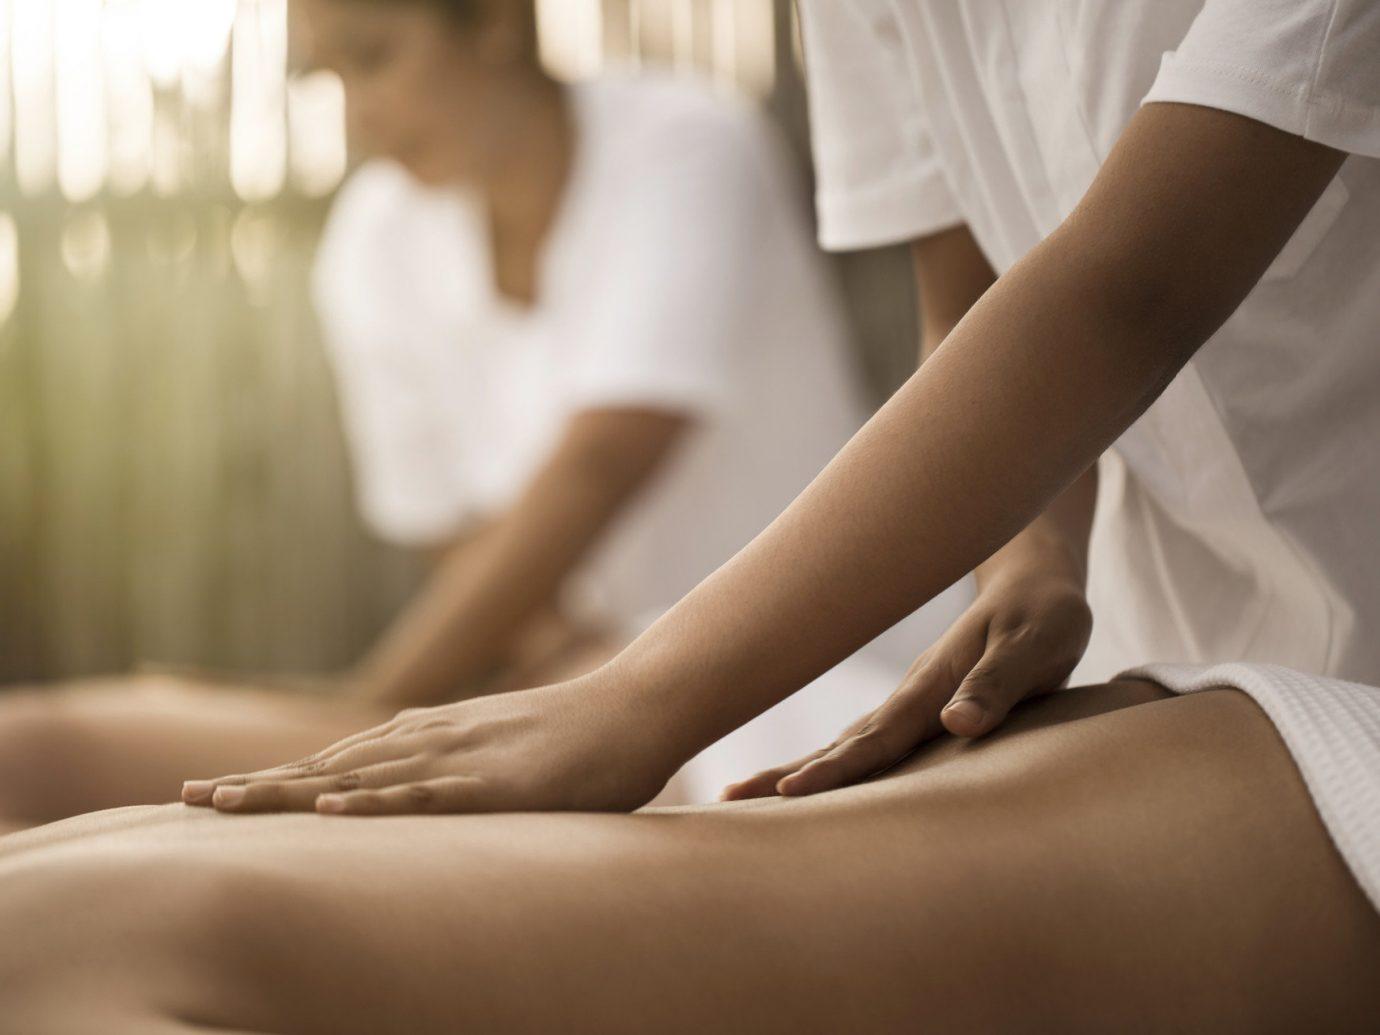 Health + Wellness Spa Retreats Travel Tips person indoor massage leg sense human body